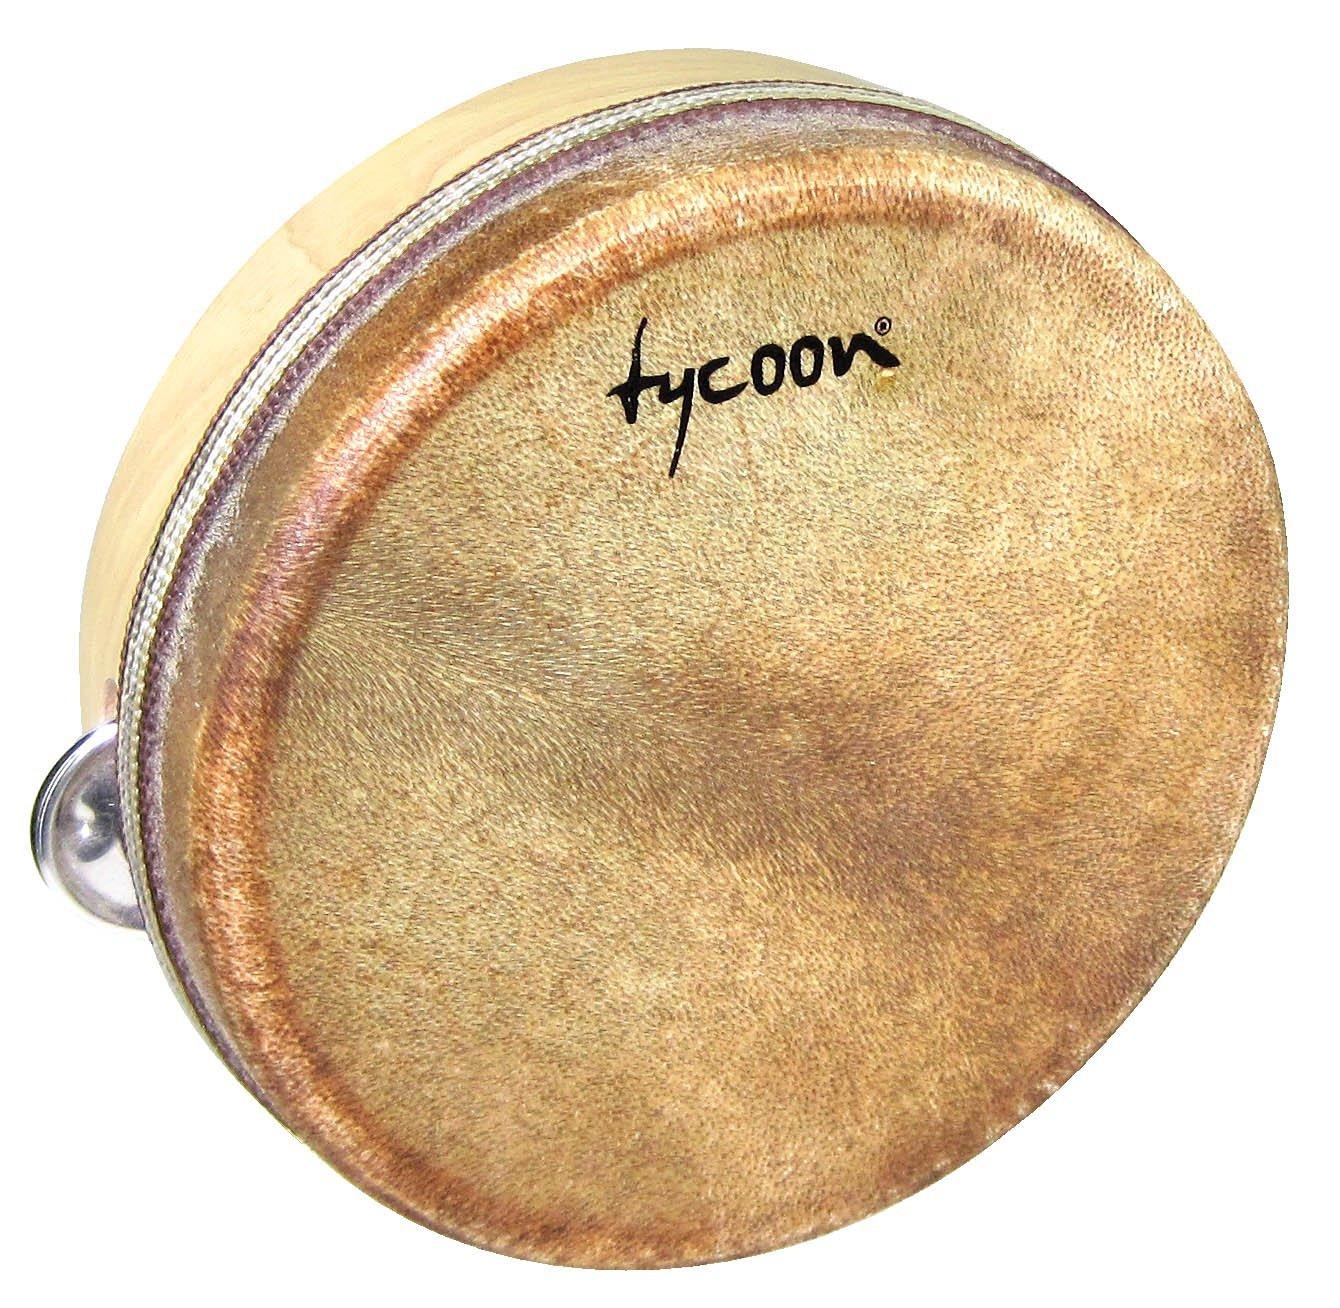 Tycoon Percussion TBFD-KJ 7 Kanjira Drum